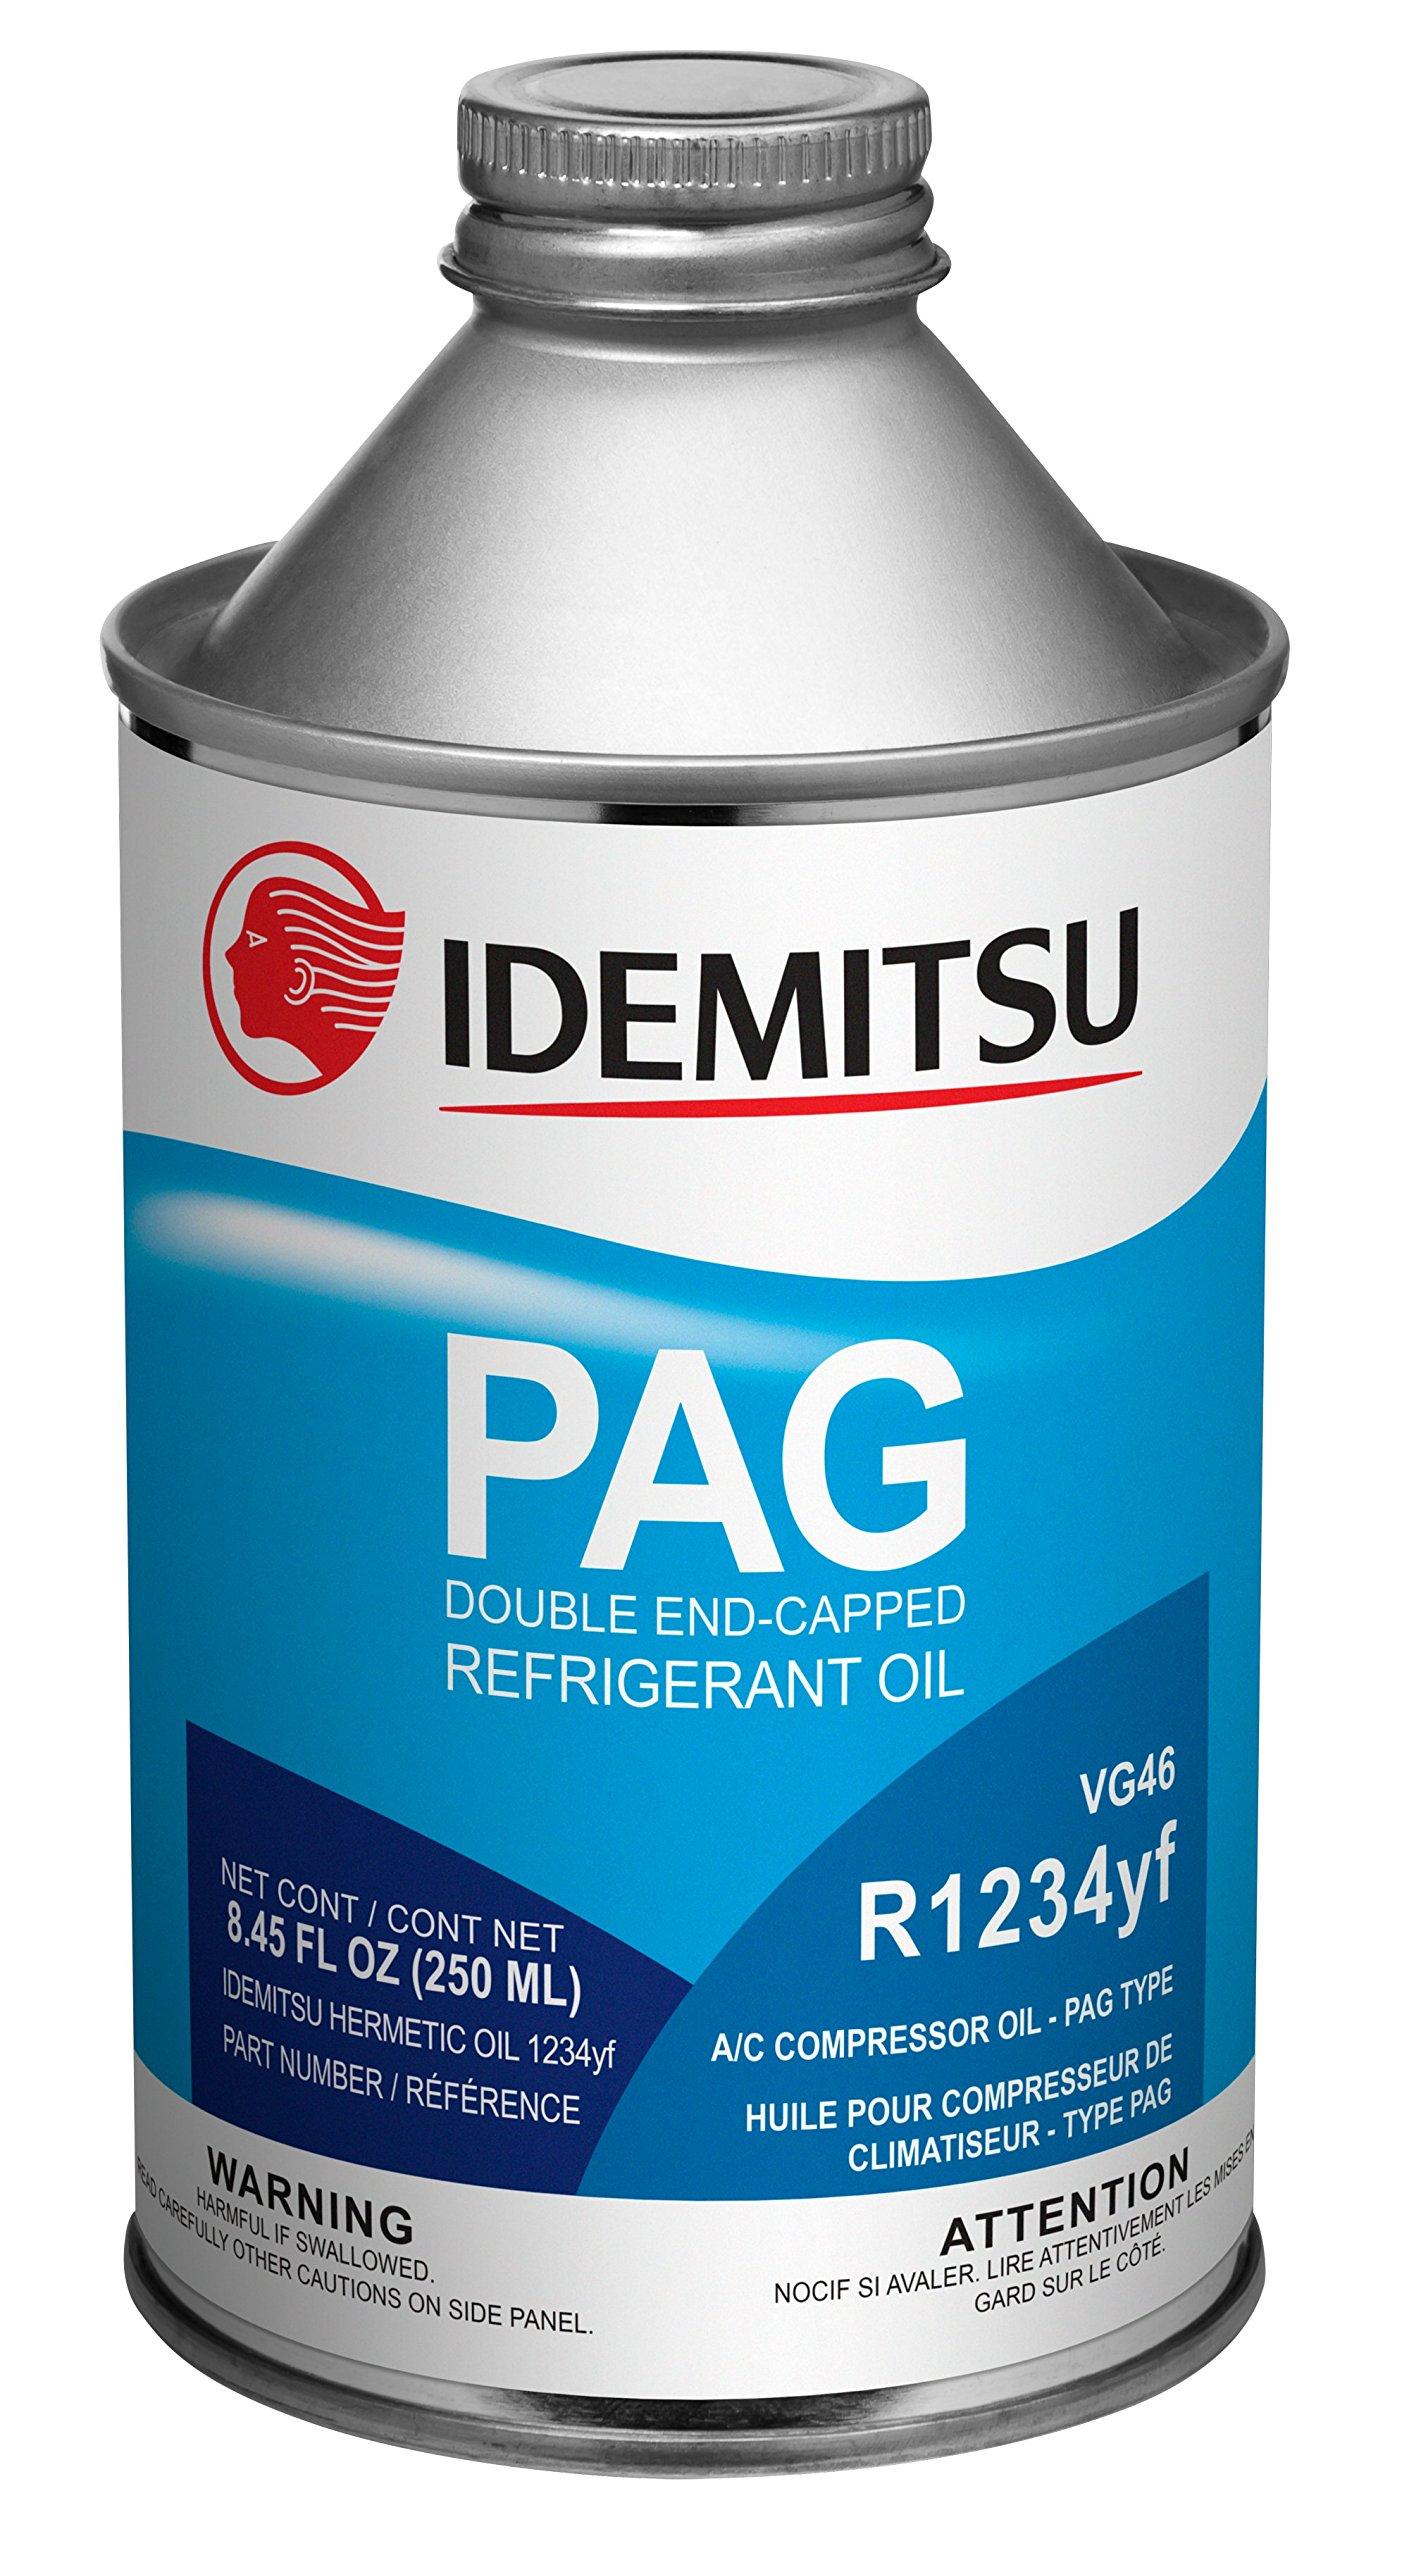 Idemitsu 32450017-70200C020 Air Conditioning Compressor Pag Oil R1234yf, 8. fluid_ounces